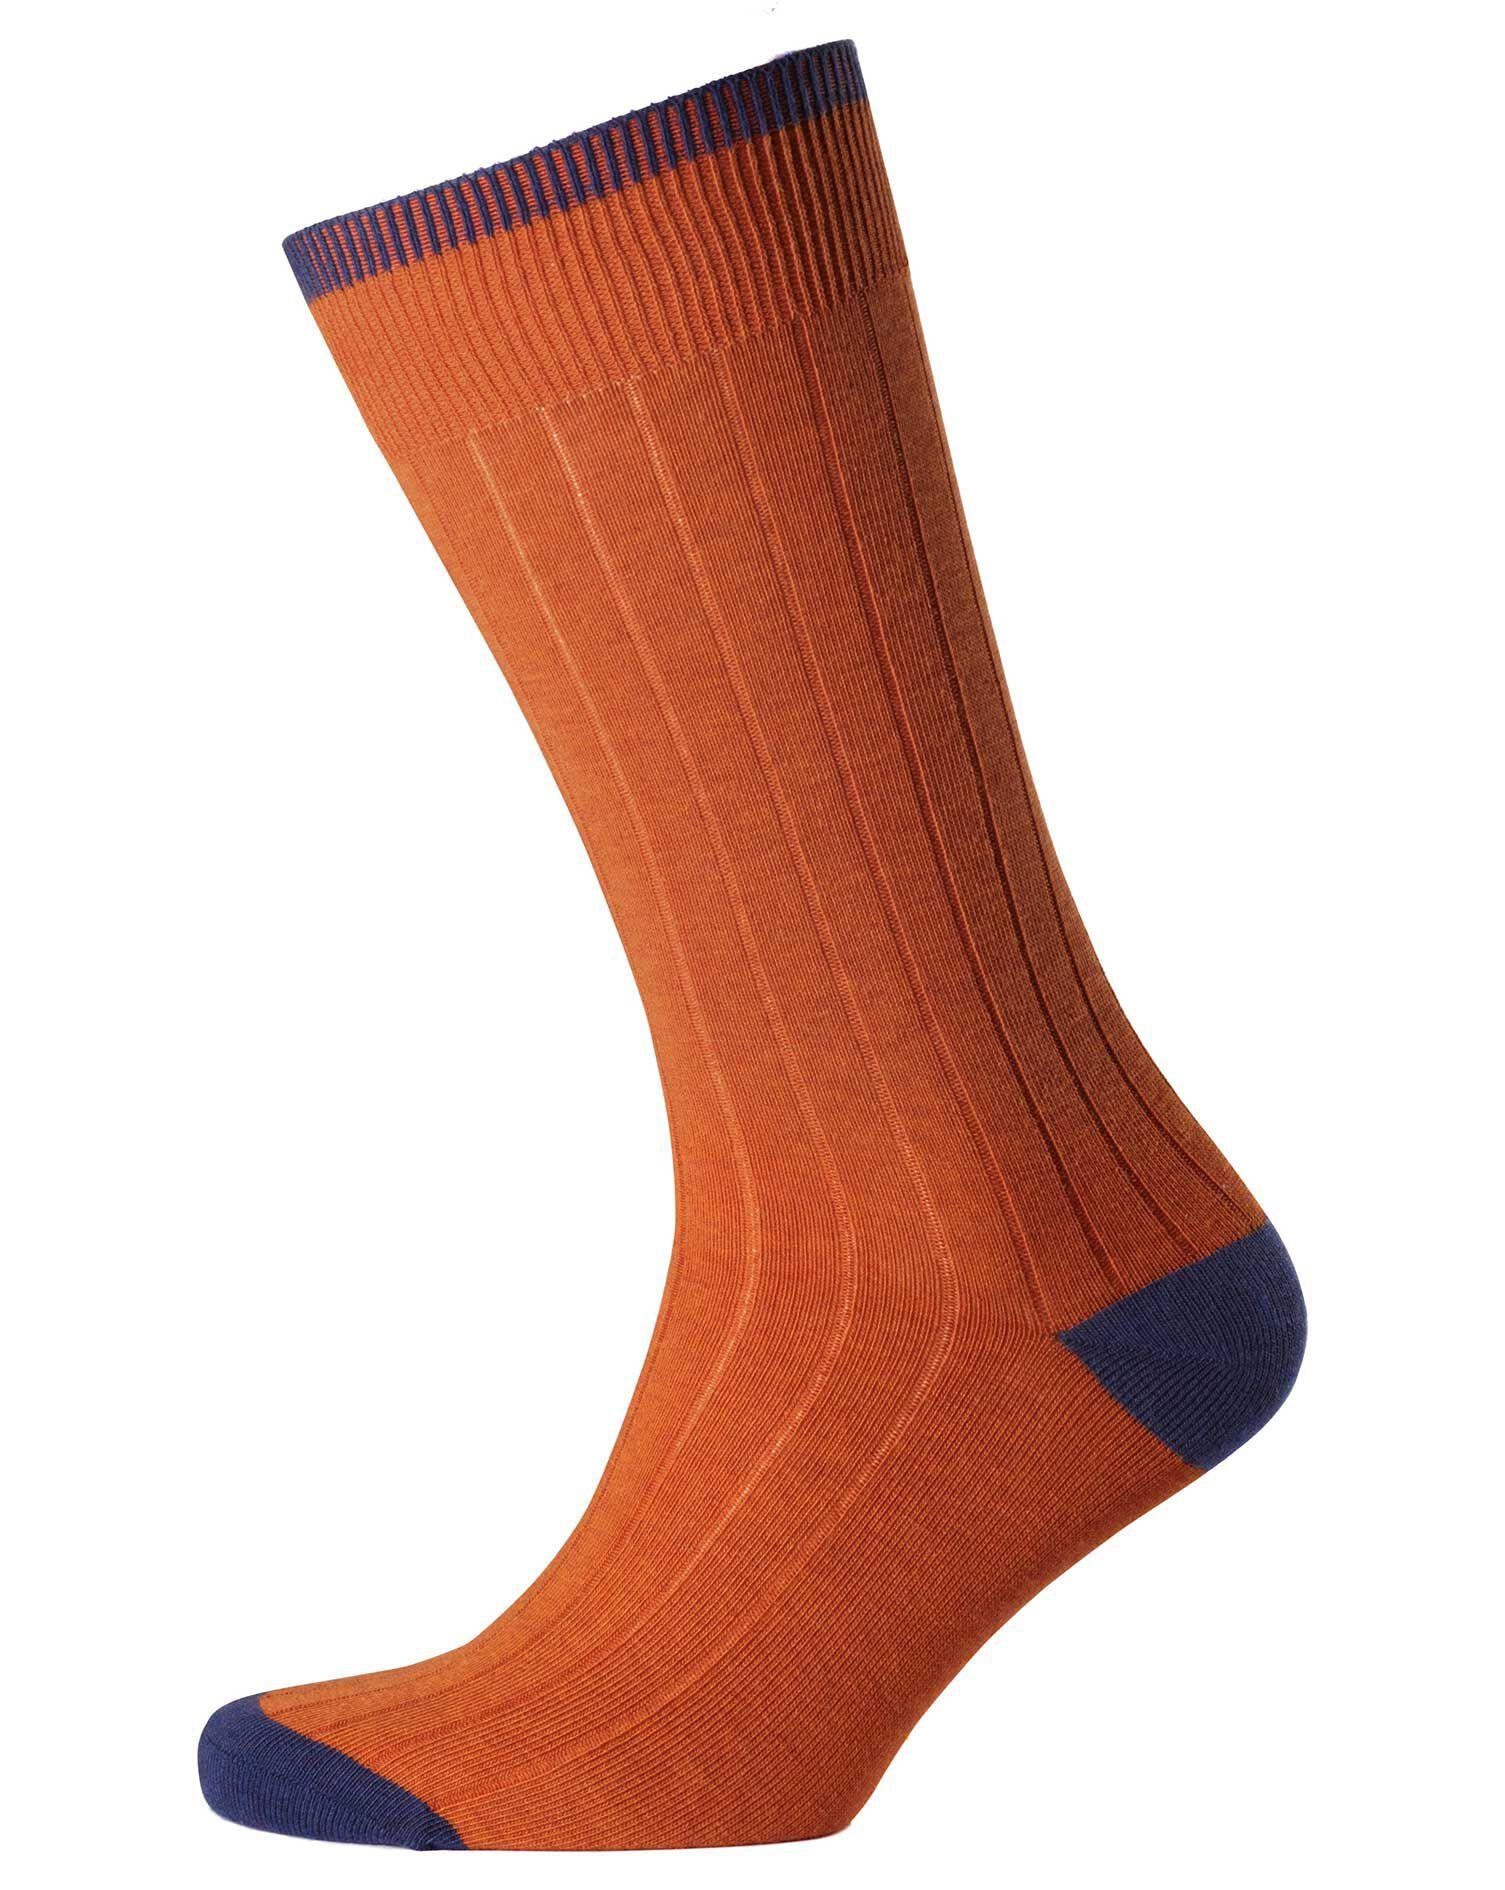 Orange Ribbed Socks Size Large by Charles Tyrwhitt